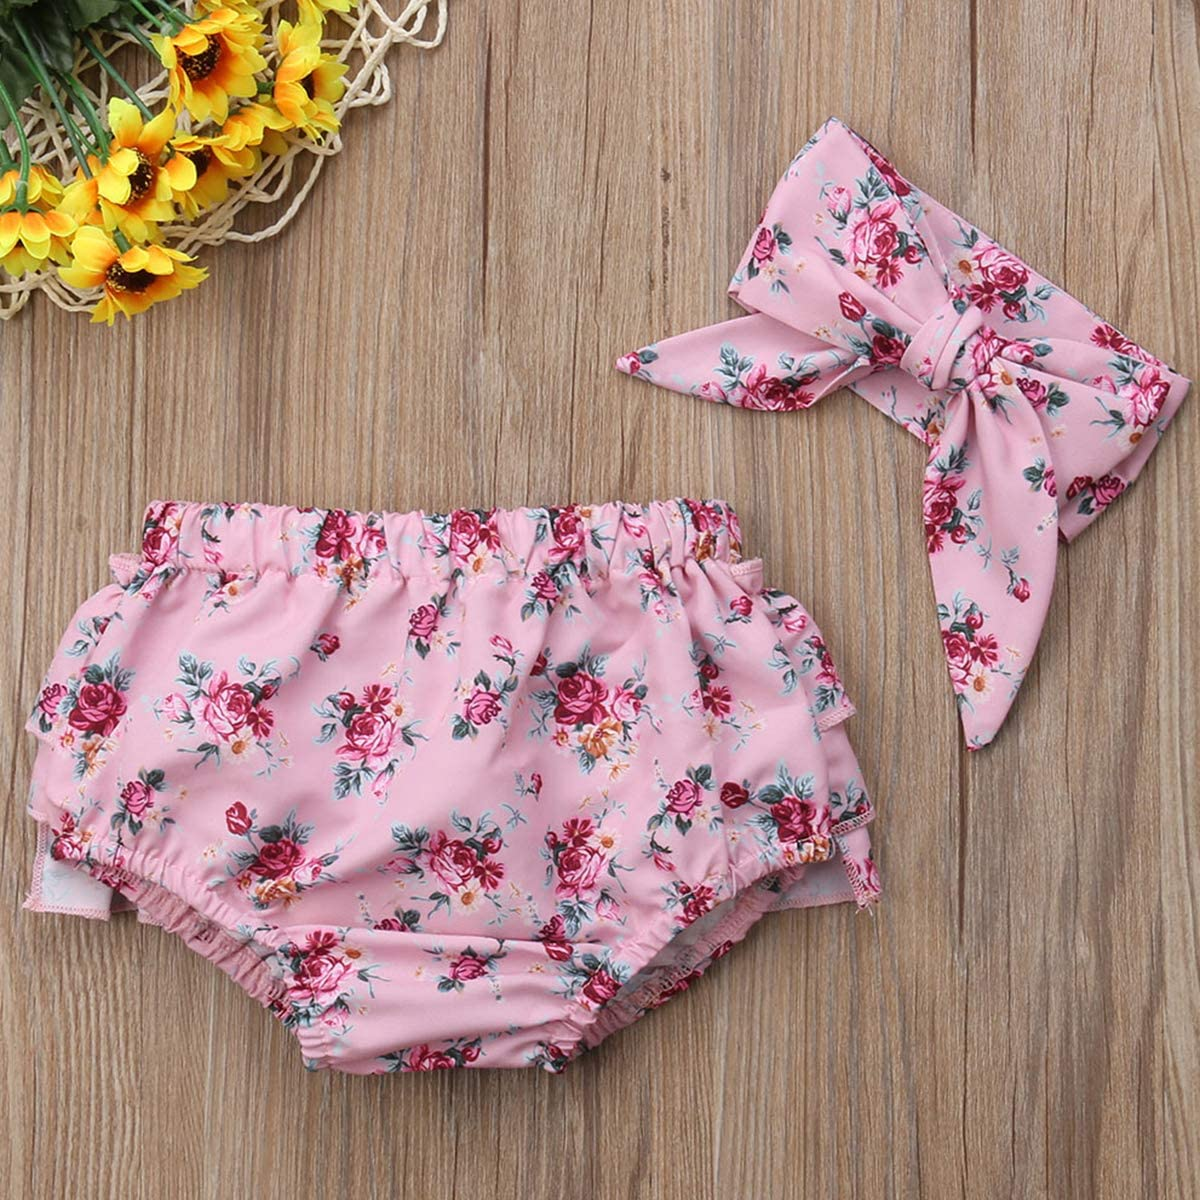 Newborn Cute Kids Baby Girls Floral Ruffle Shorts Underwear Diaper Cover Bloomer Bow Headband Set